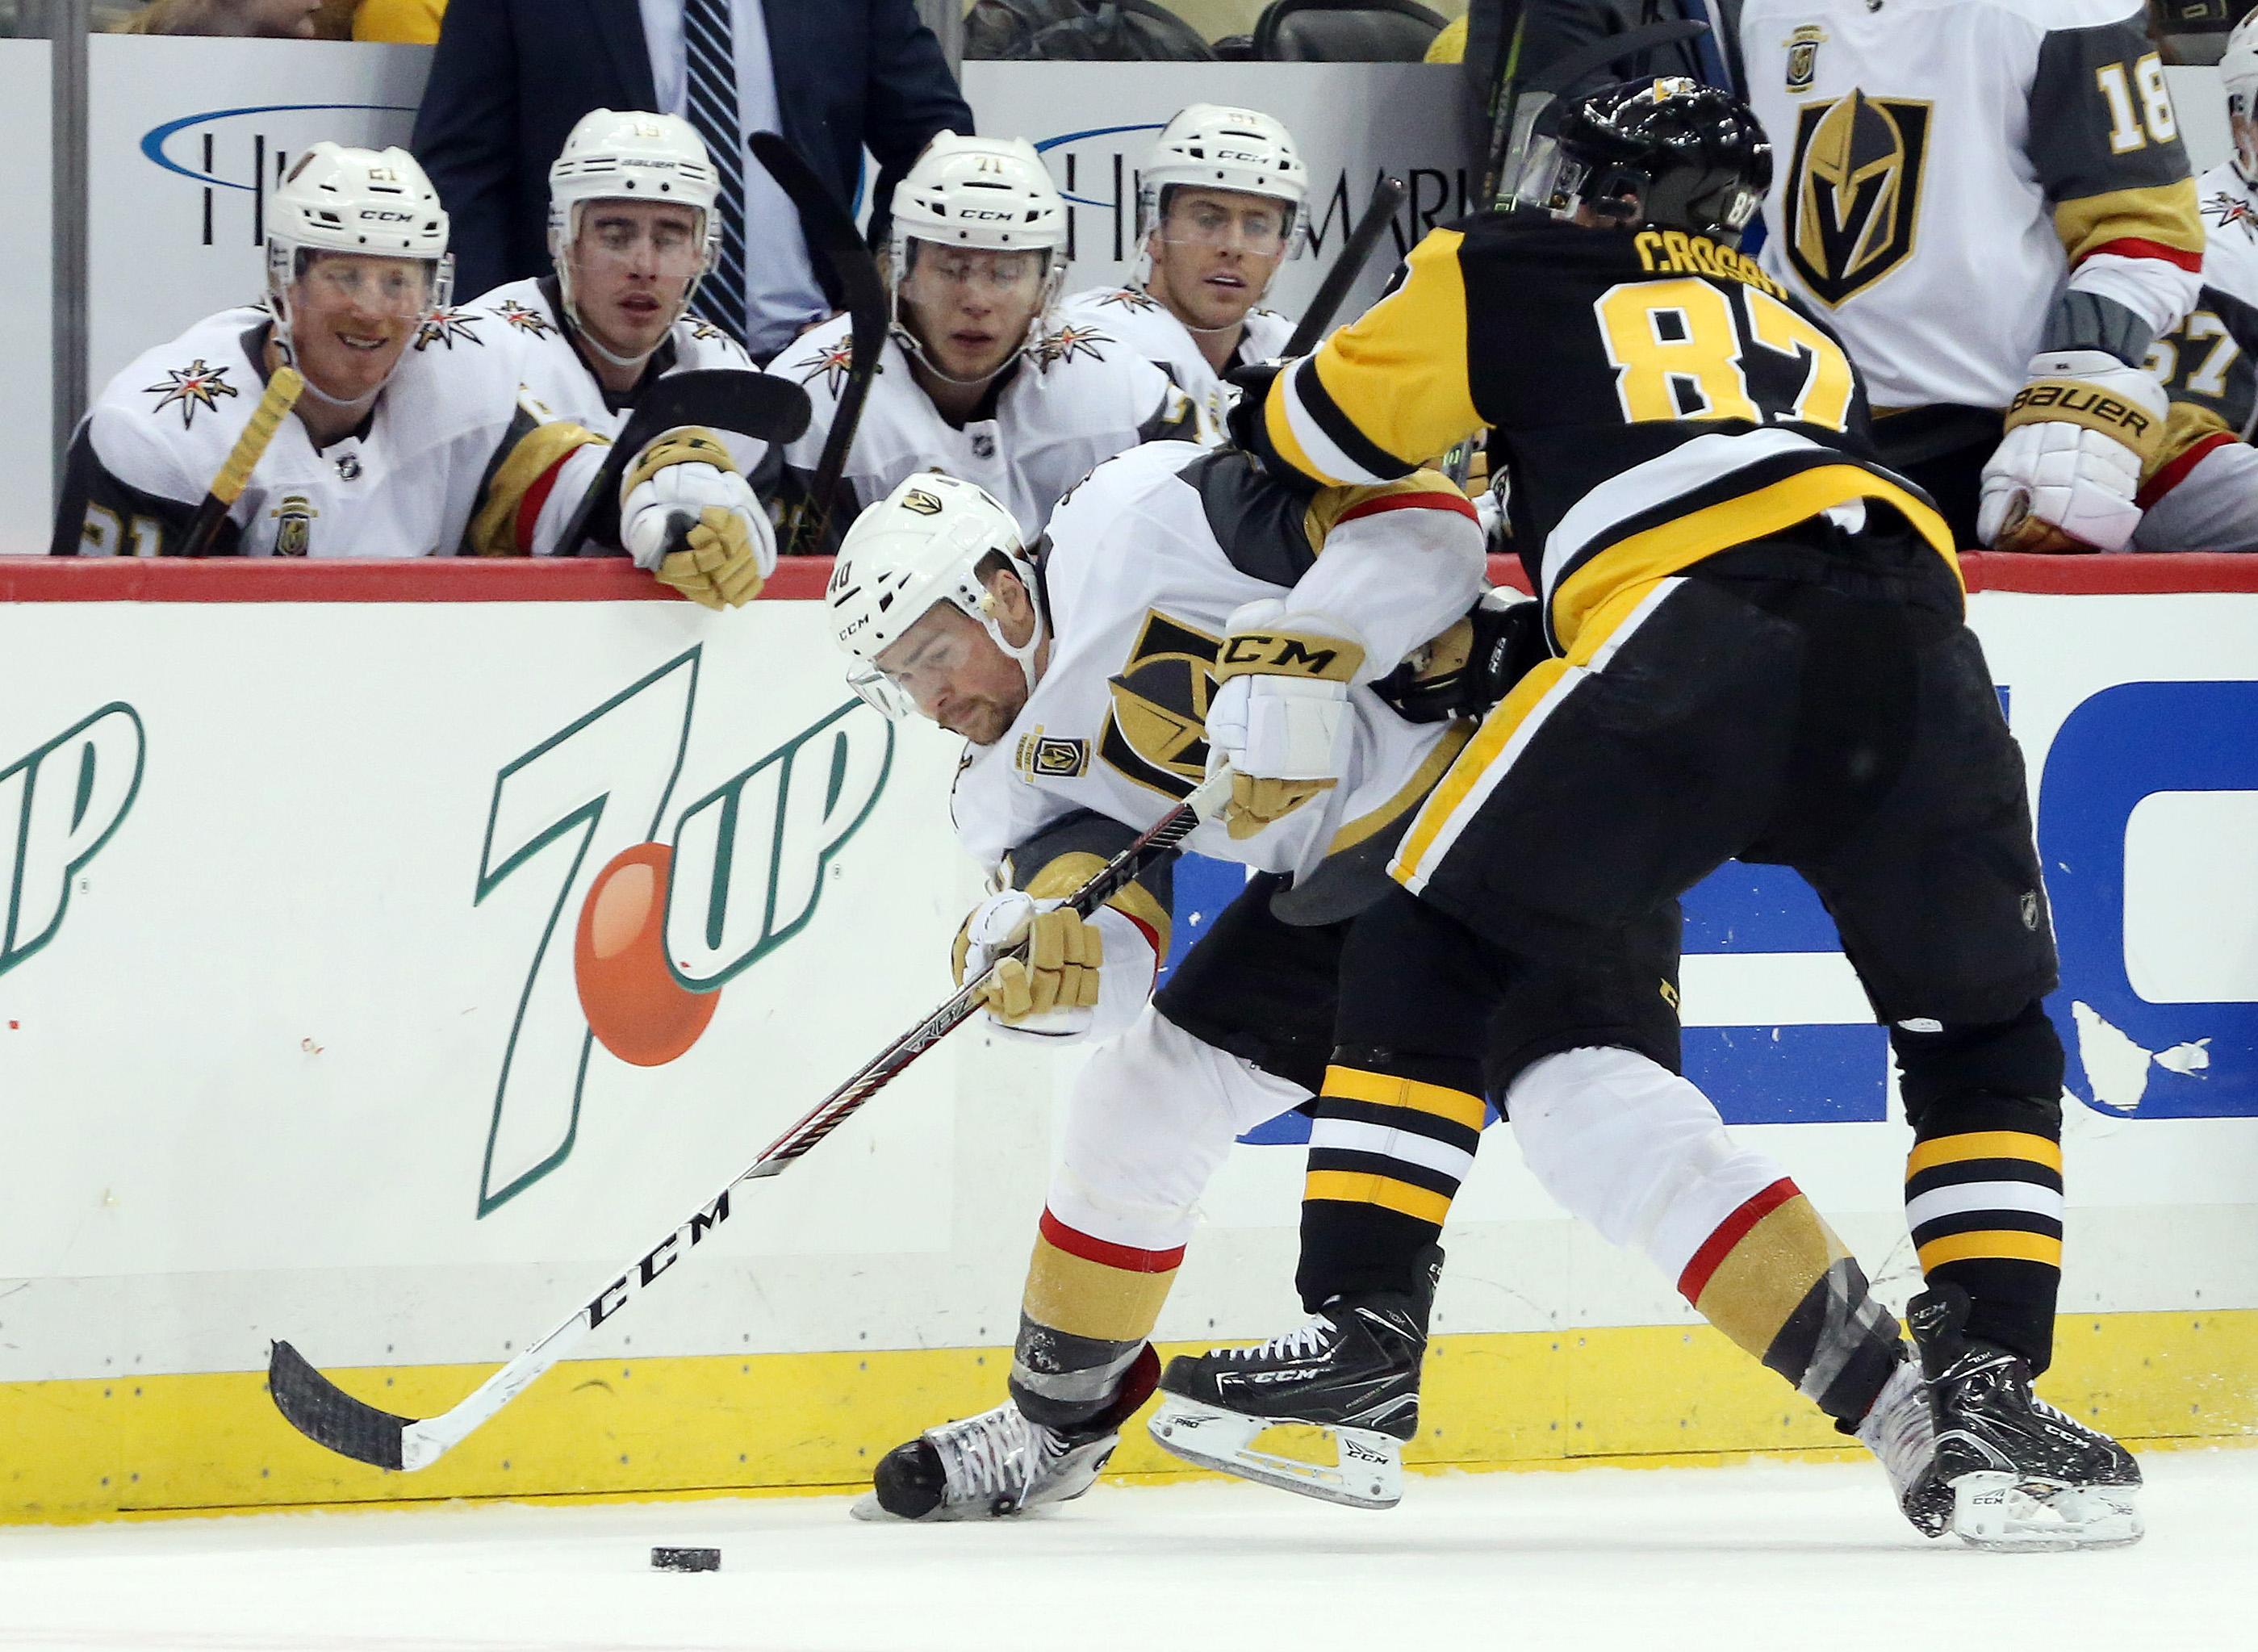 NHL: Vegas Golden Knights at Pittsburgh Penguins